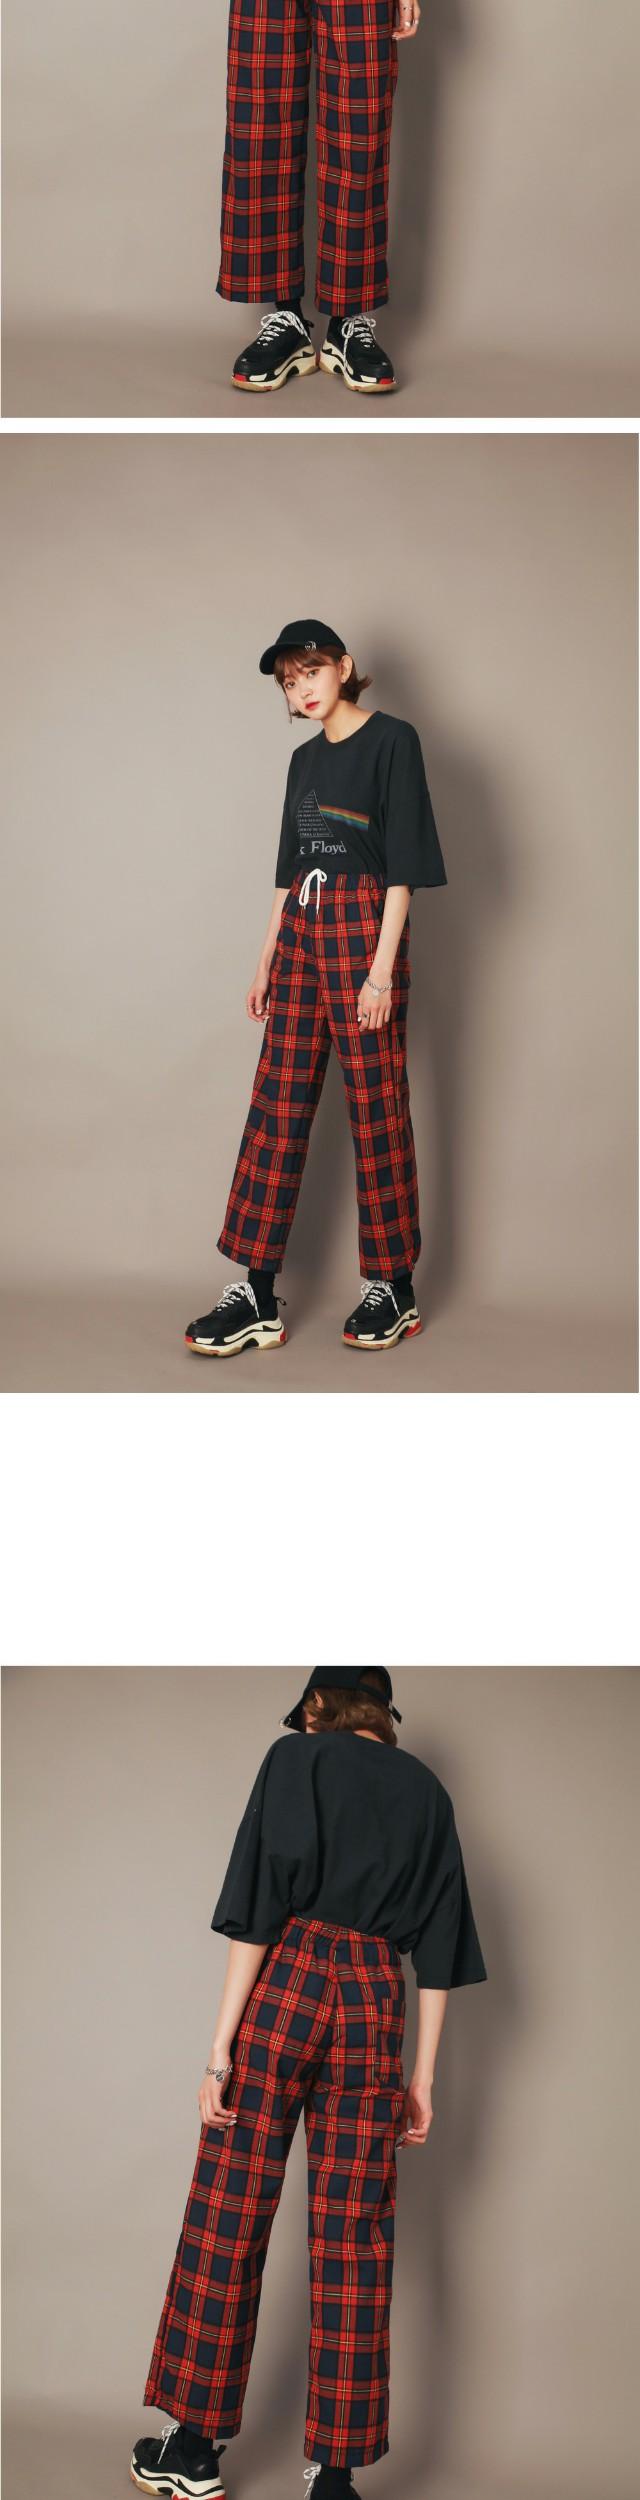 Neon Check wide pants